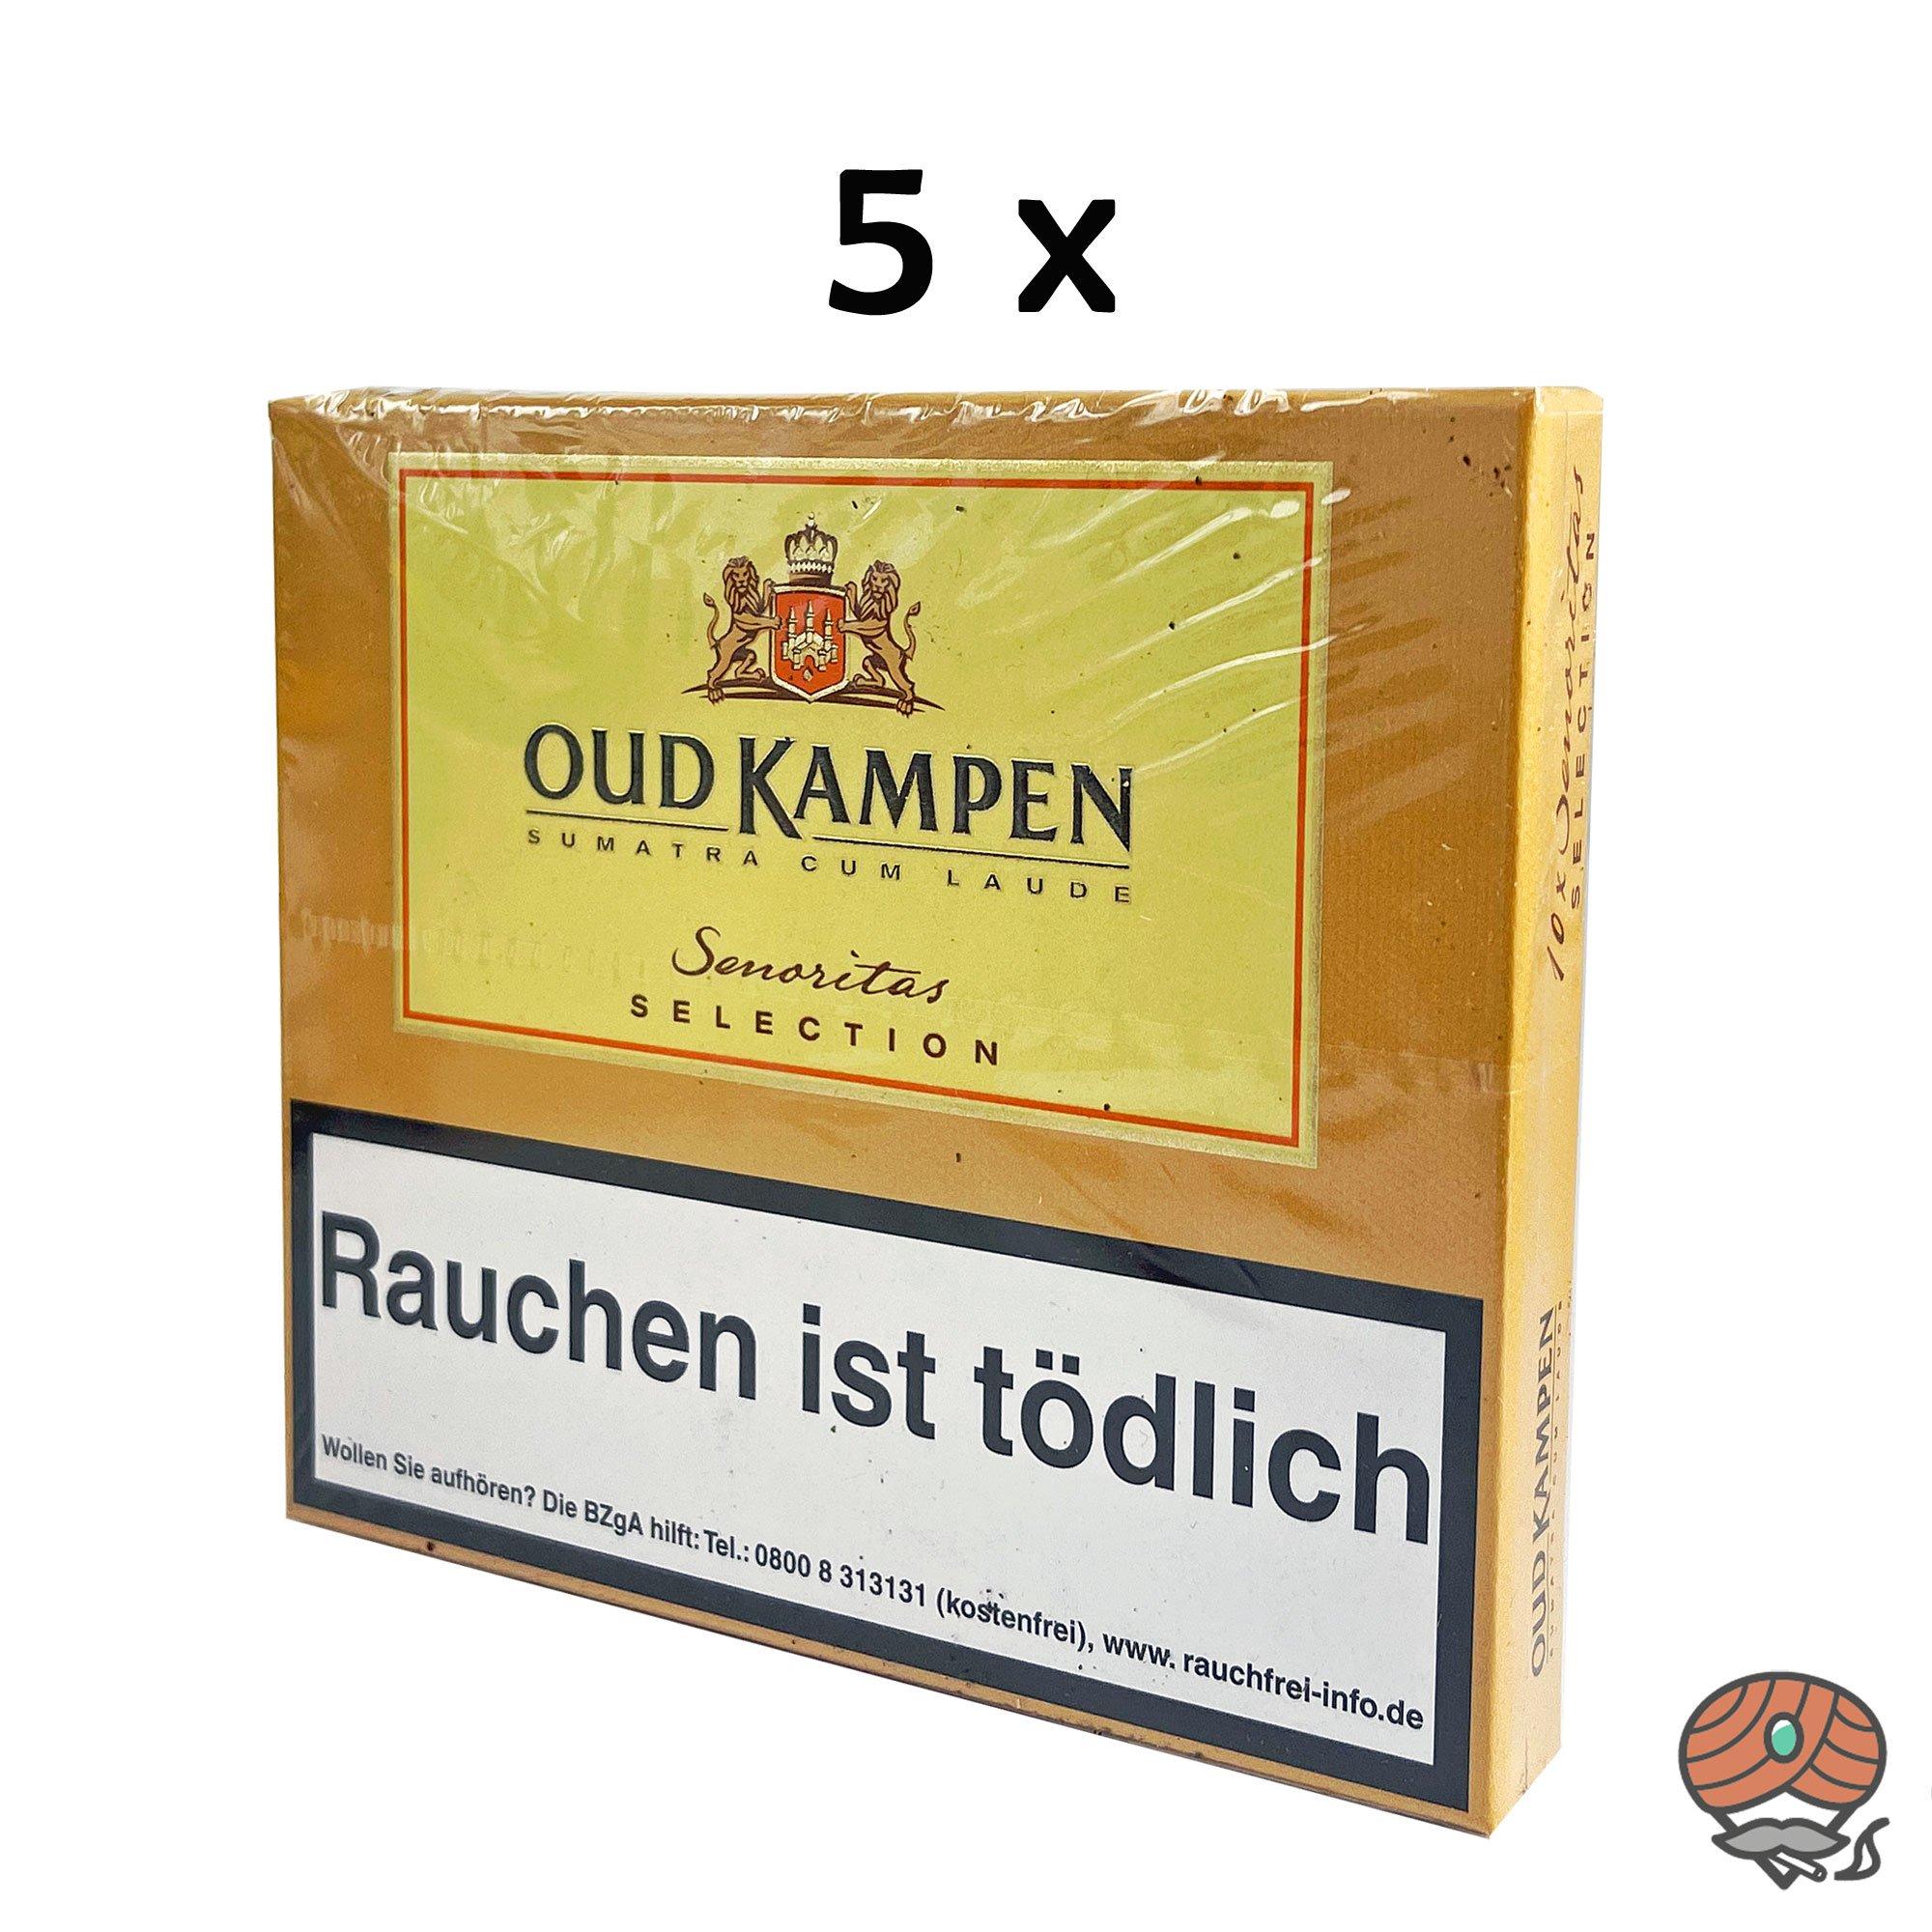 5x Oud Kampen Senoritas Selection Zigarillos 100% Tabak